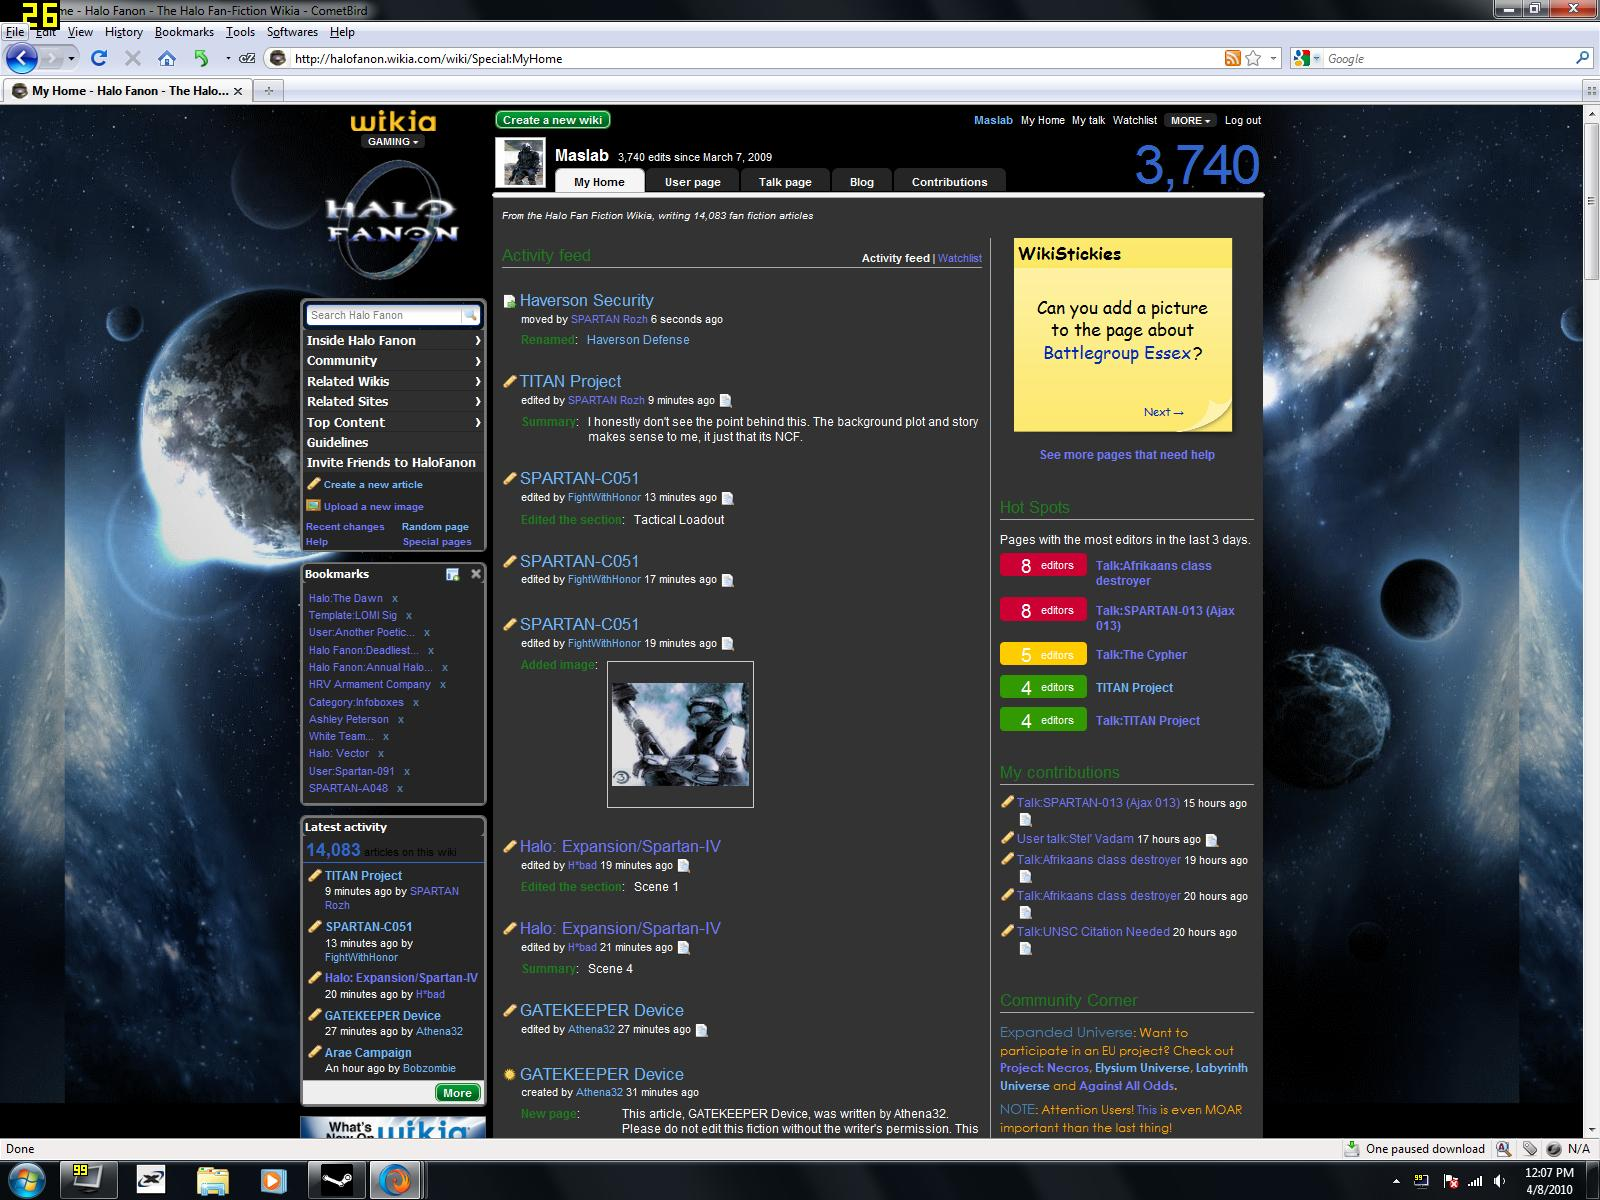 Maslab/Wikia Issue